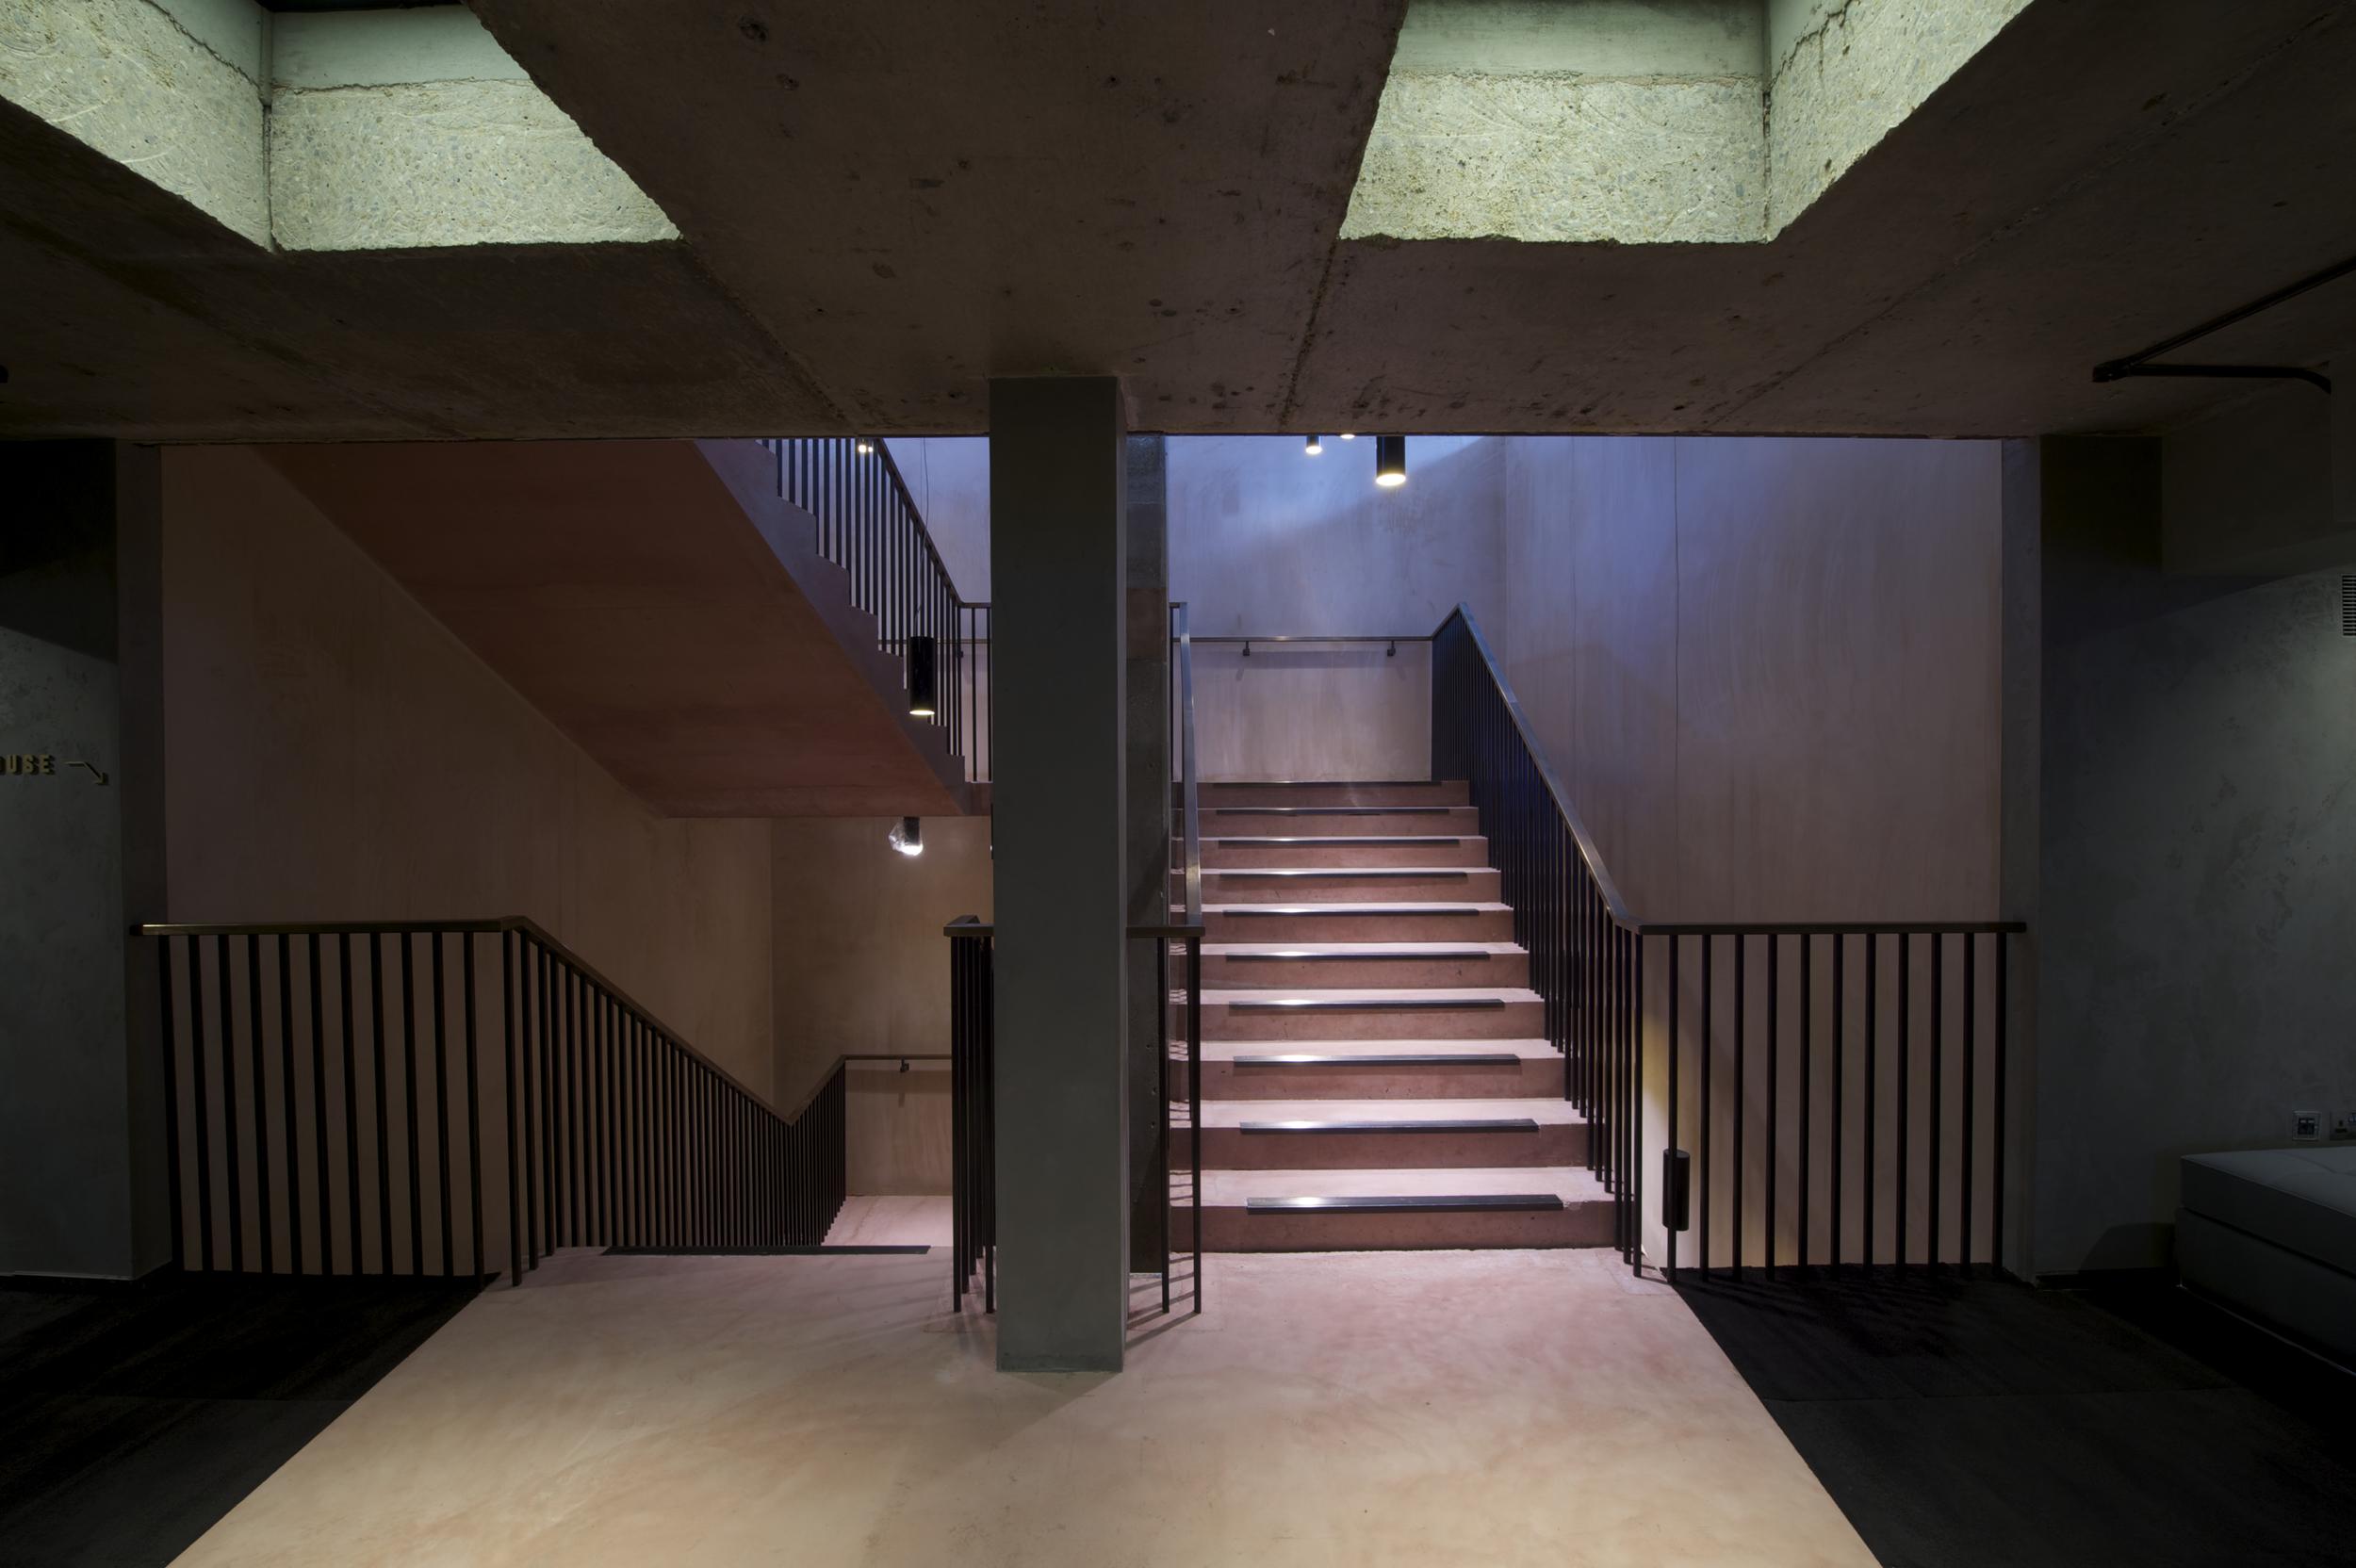 Architecture Tour of the Cinema + Antonioni's The Passenger